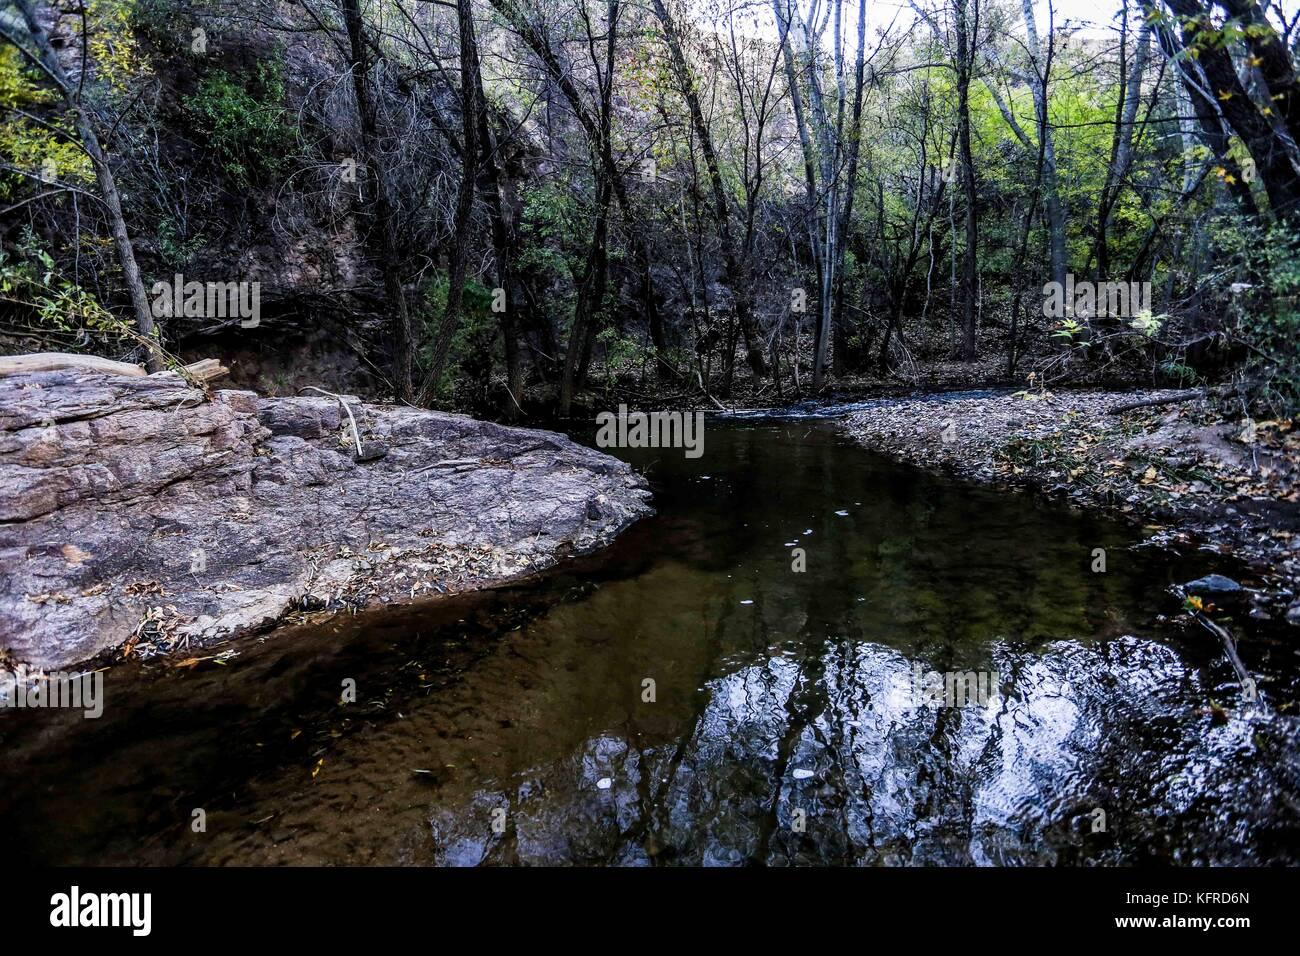 Les barrages de castors dans l'écosystème la Cuenca los ojos de Agua Prieta, Sonora, Mexique. Castor Photo Stock